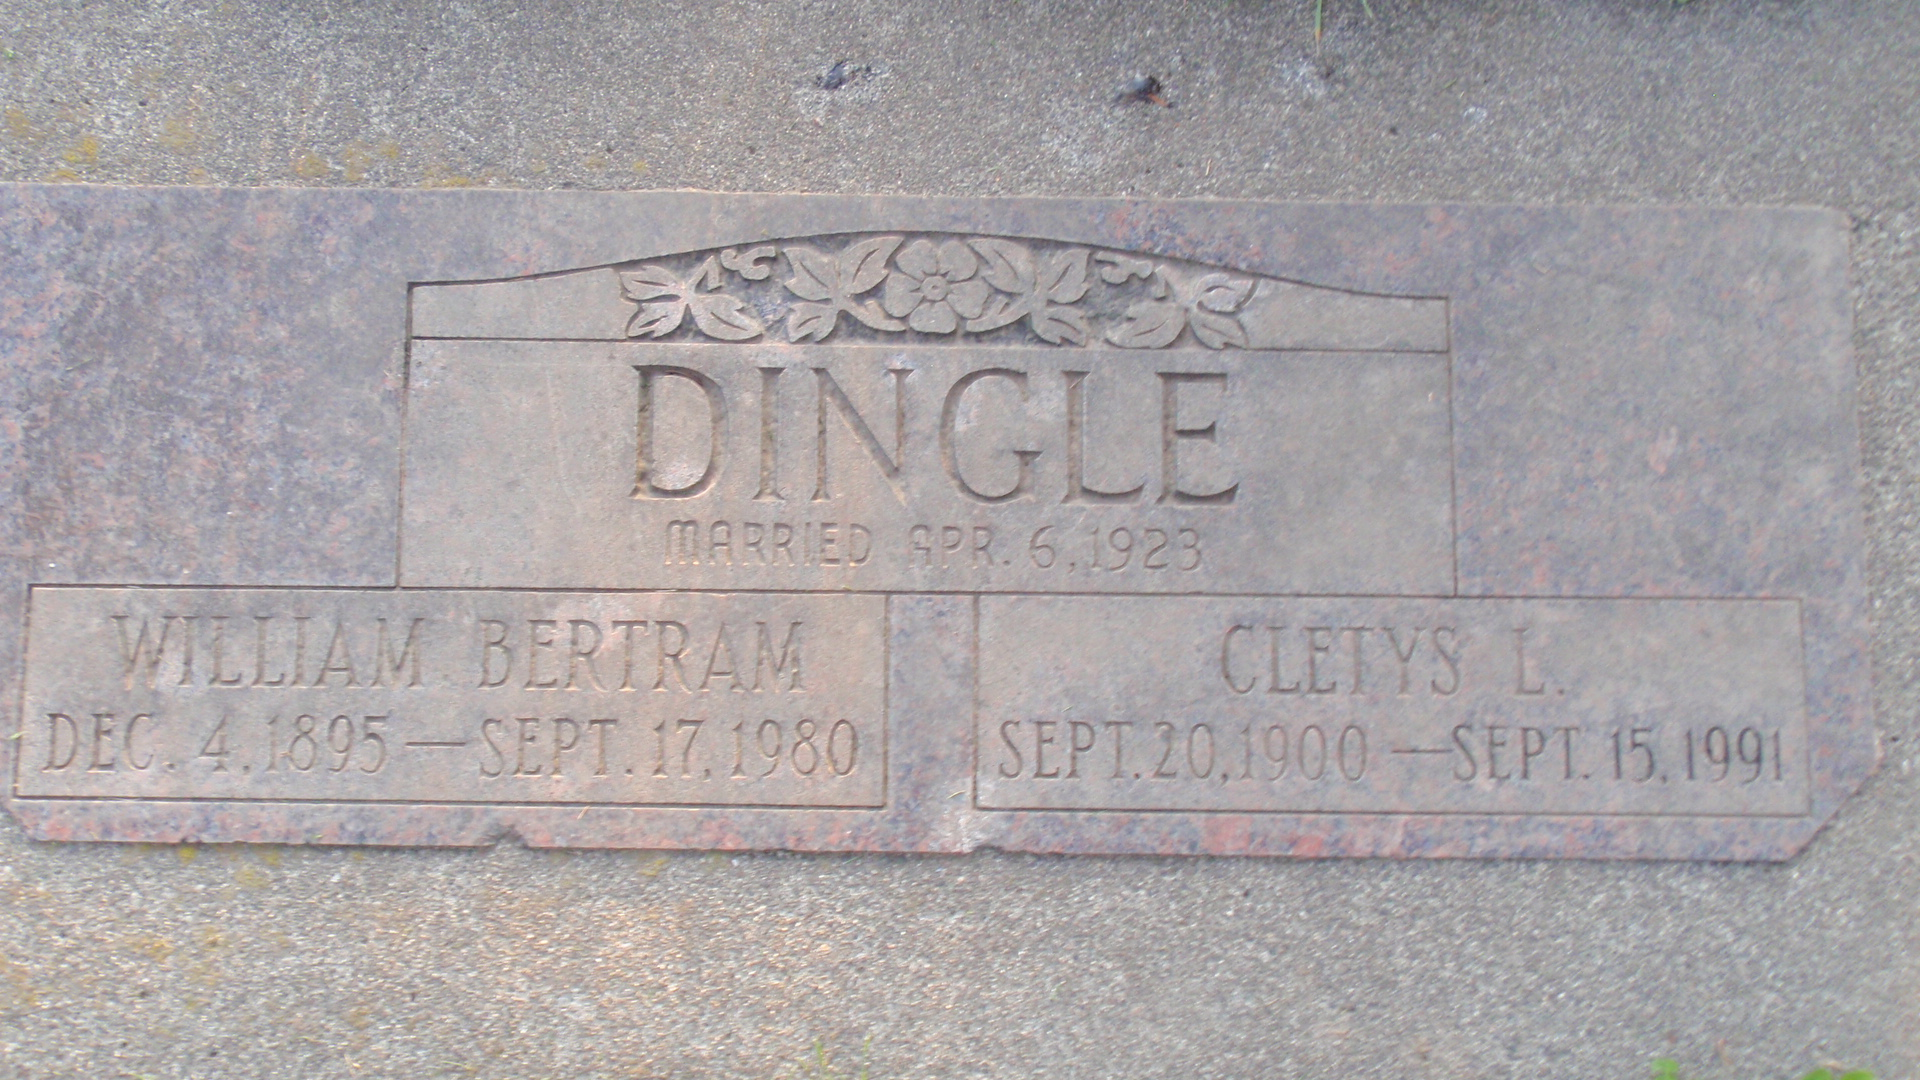 William Bertram Bert Dingle